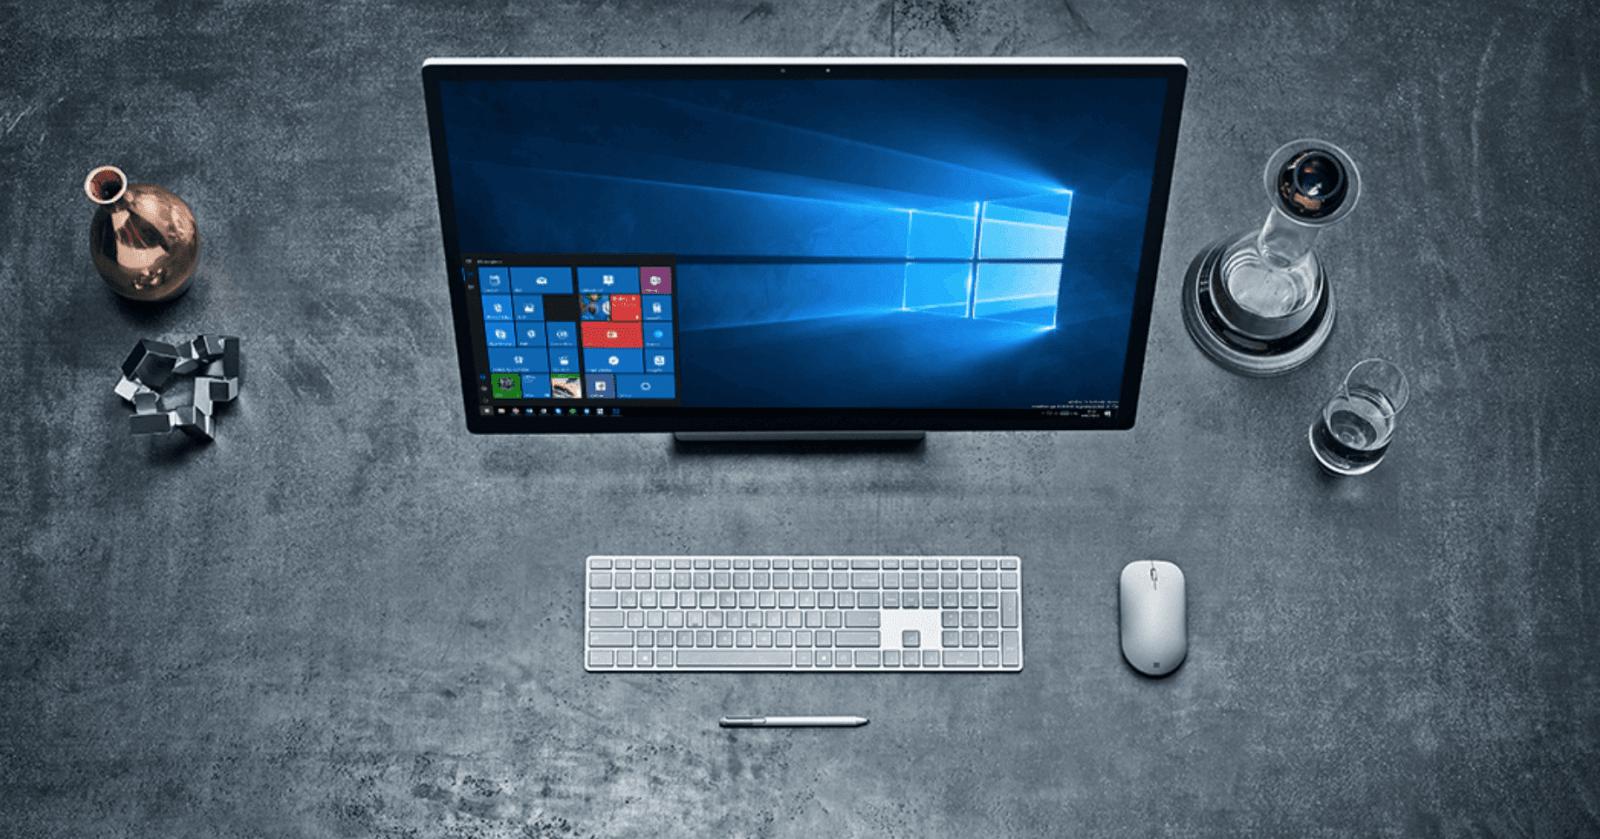 Пользователи вместо покупателей. Авторская колонка Александра Баулина (Windows 10 Creators Update cumulative update)